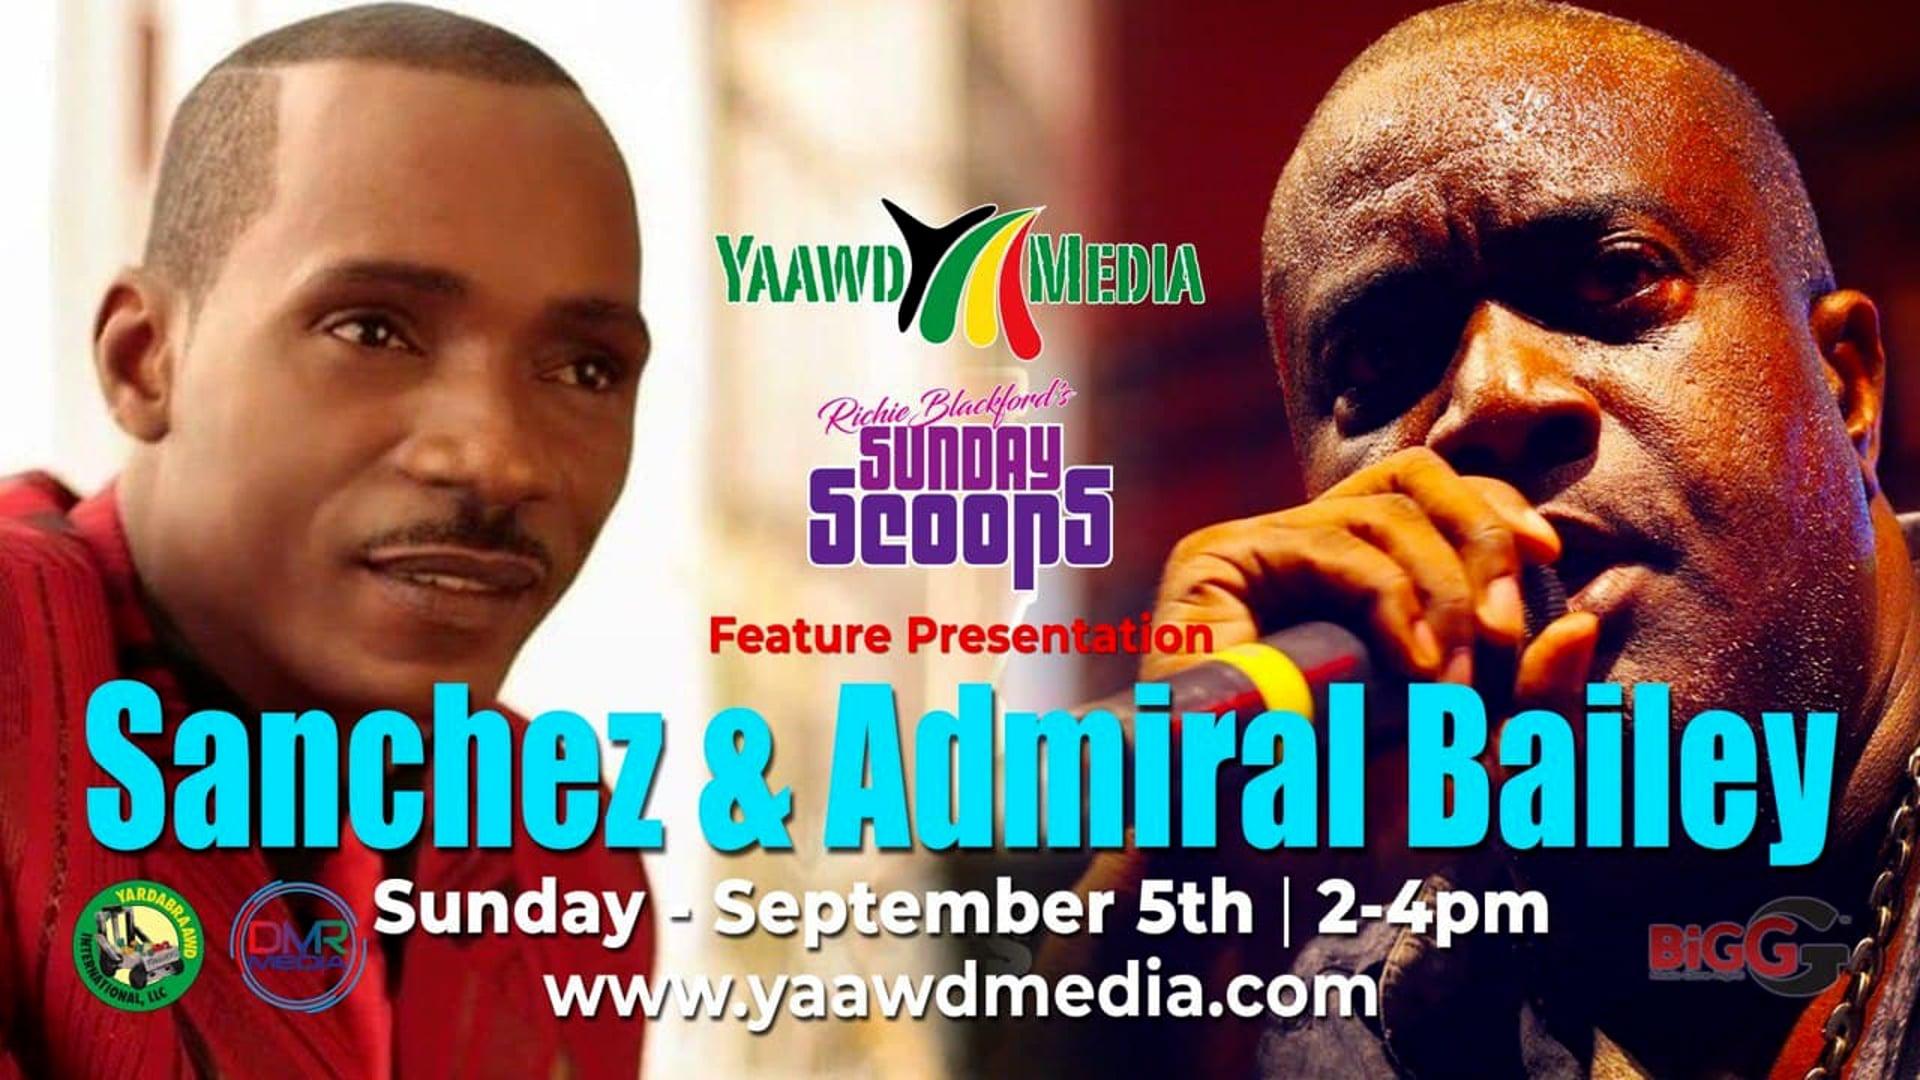 Sunday Scoops - Sanchez meets Admiral Bailey